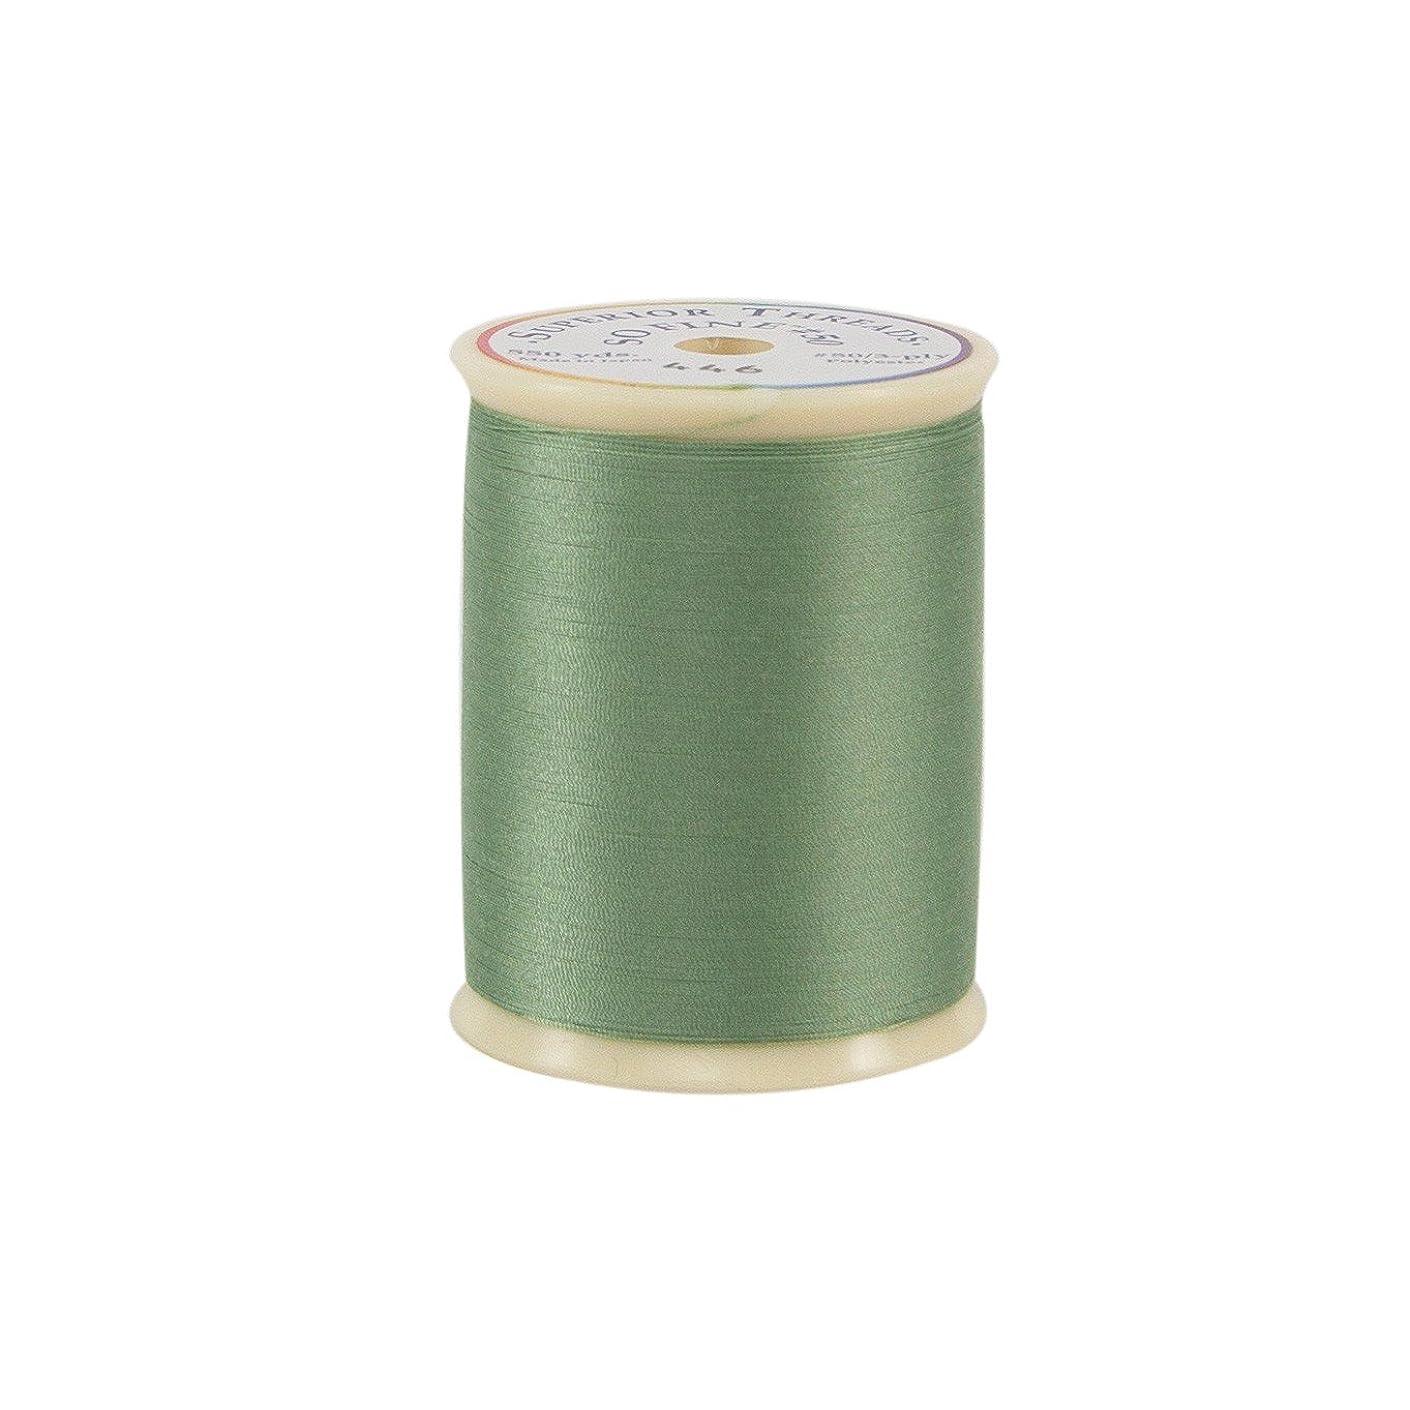 Superior Threads 11601A-446 So Fine Sage Brush 3-Ply 50W Polyester Thread, 550 yd